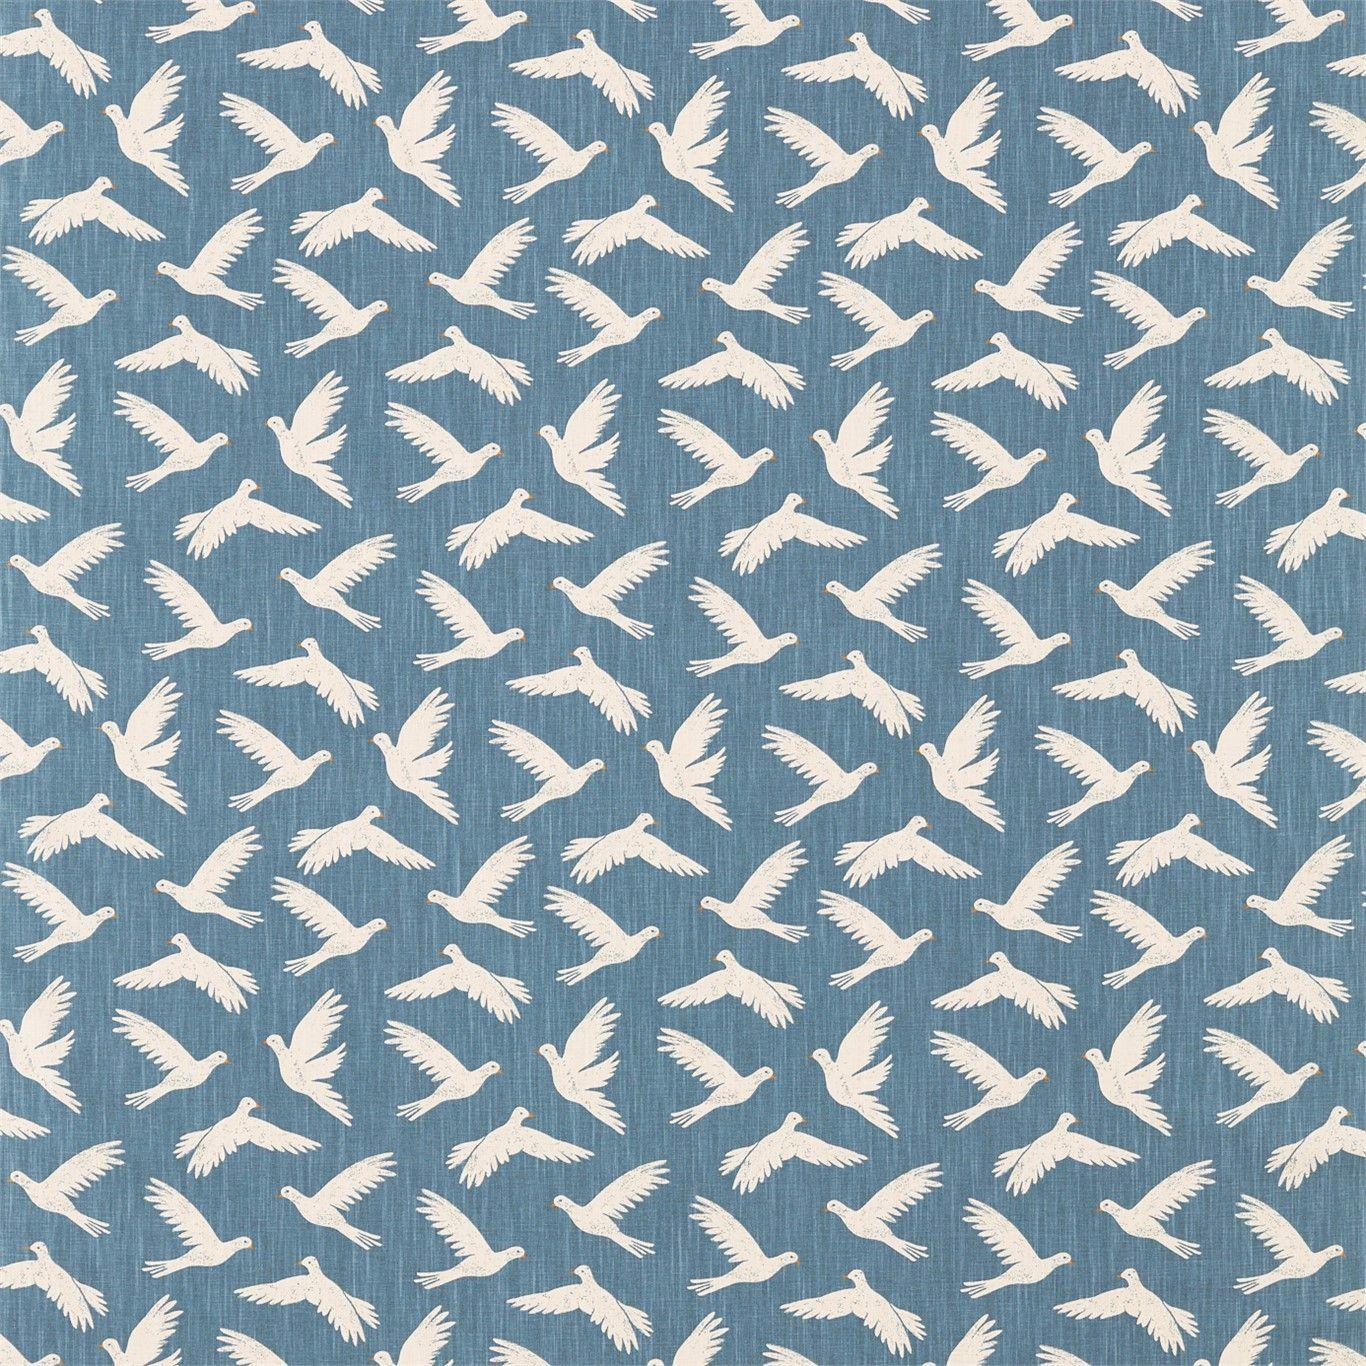 Paper Doves - Denim